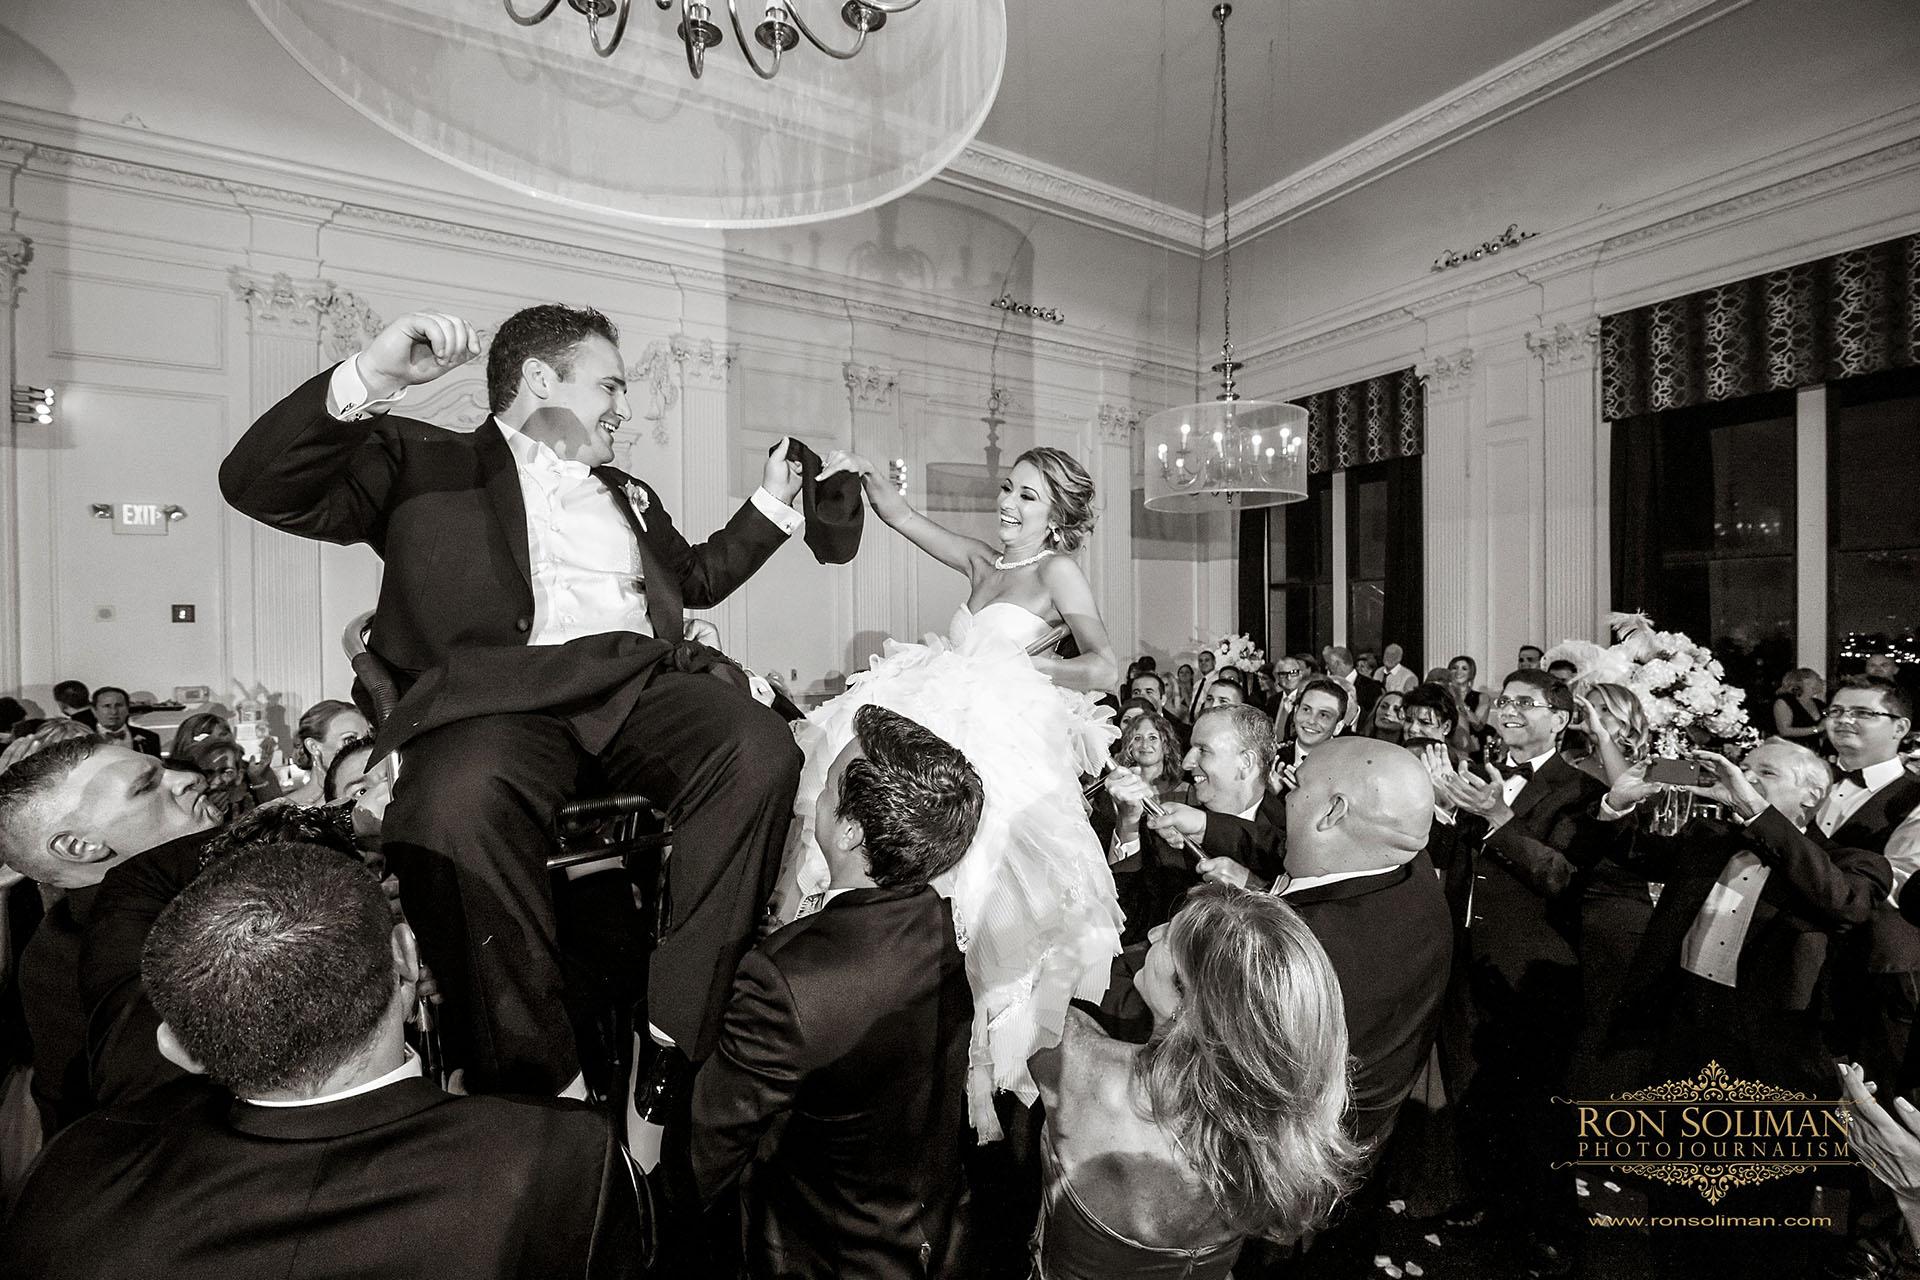 Best Hora dance photos